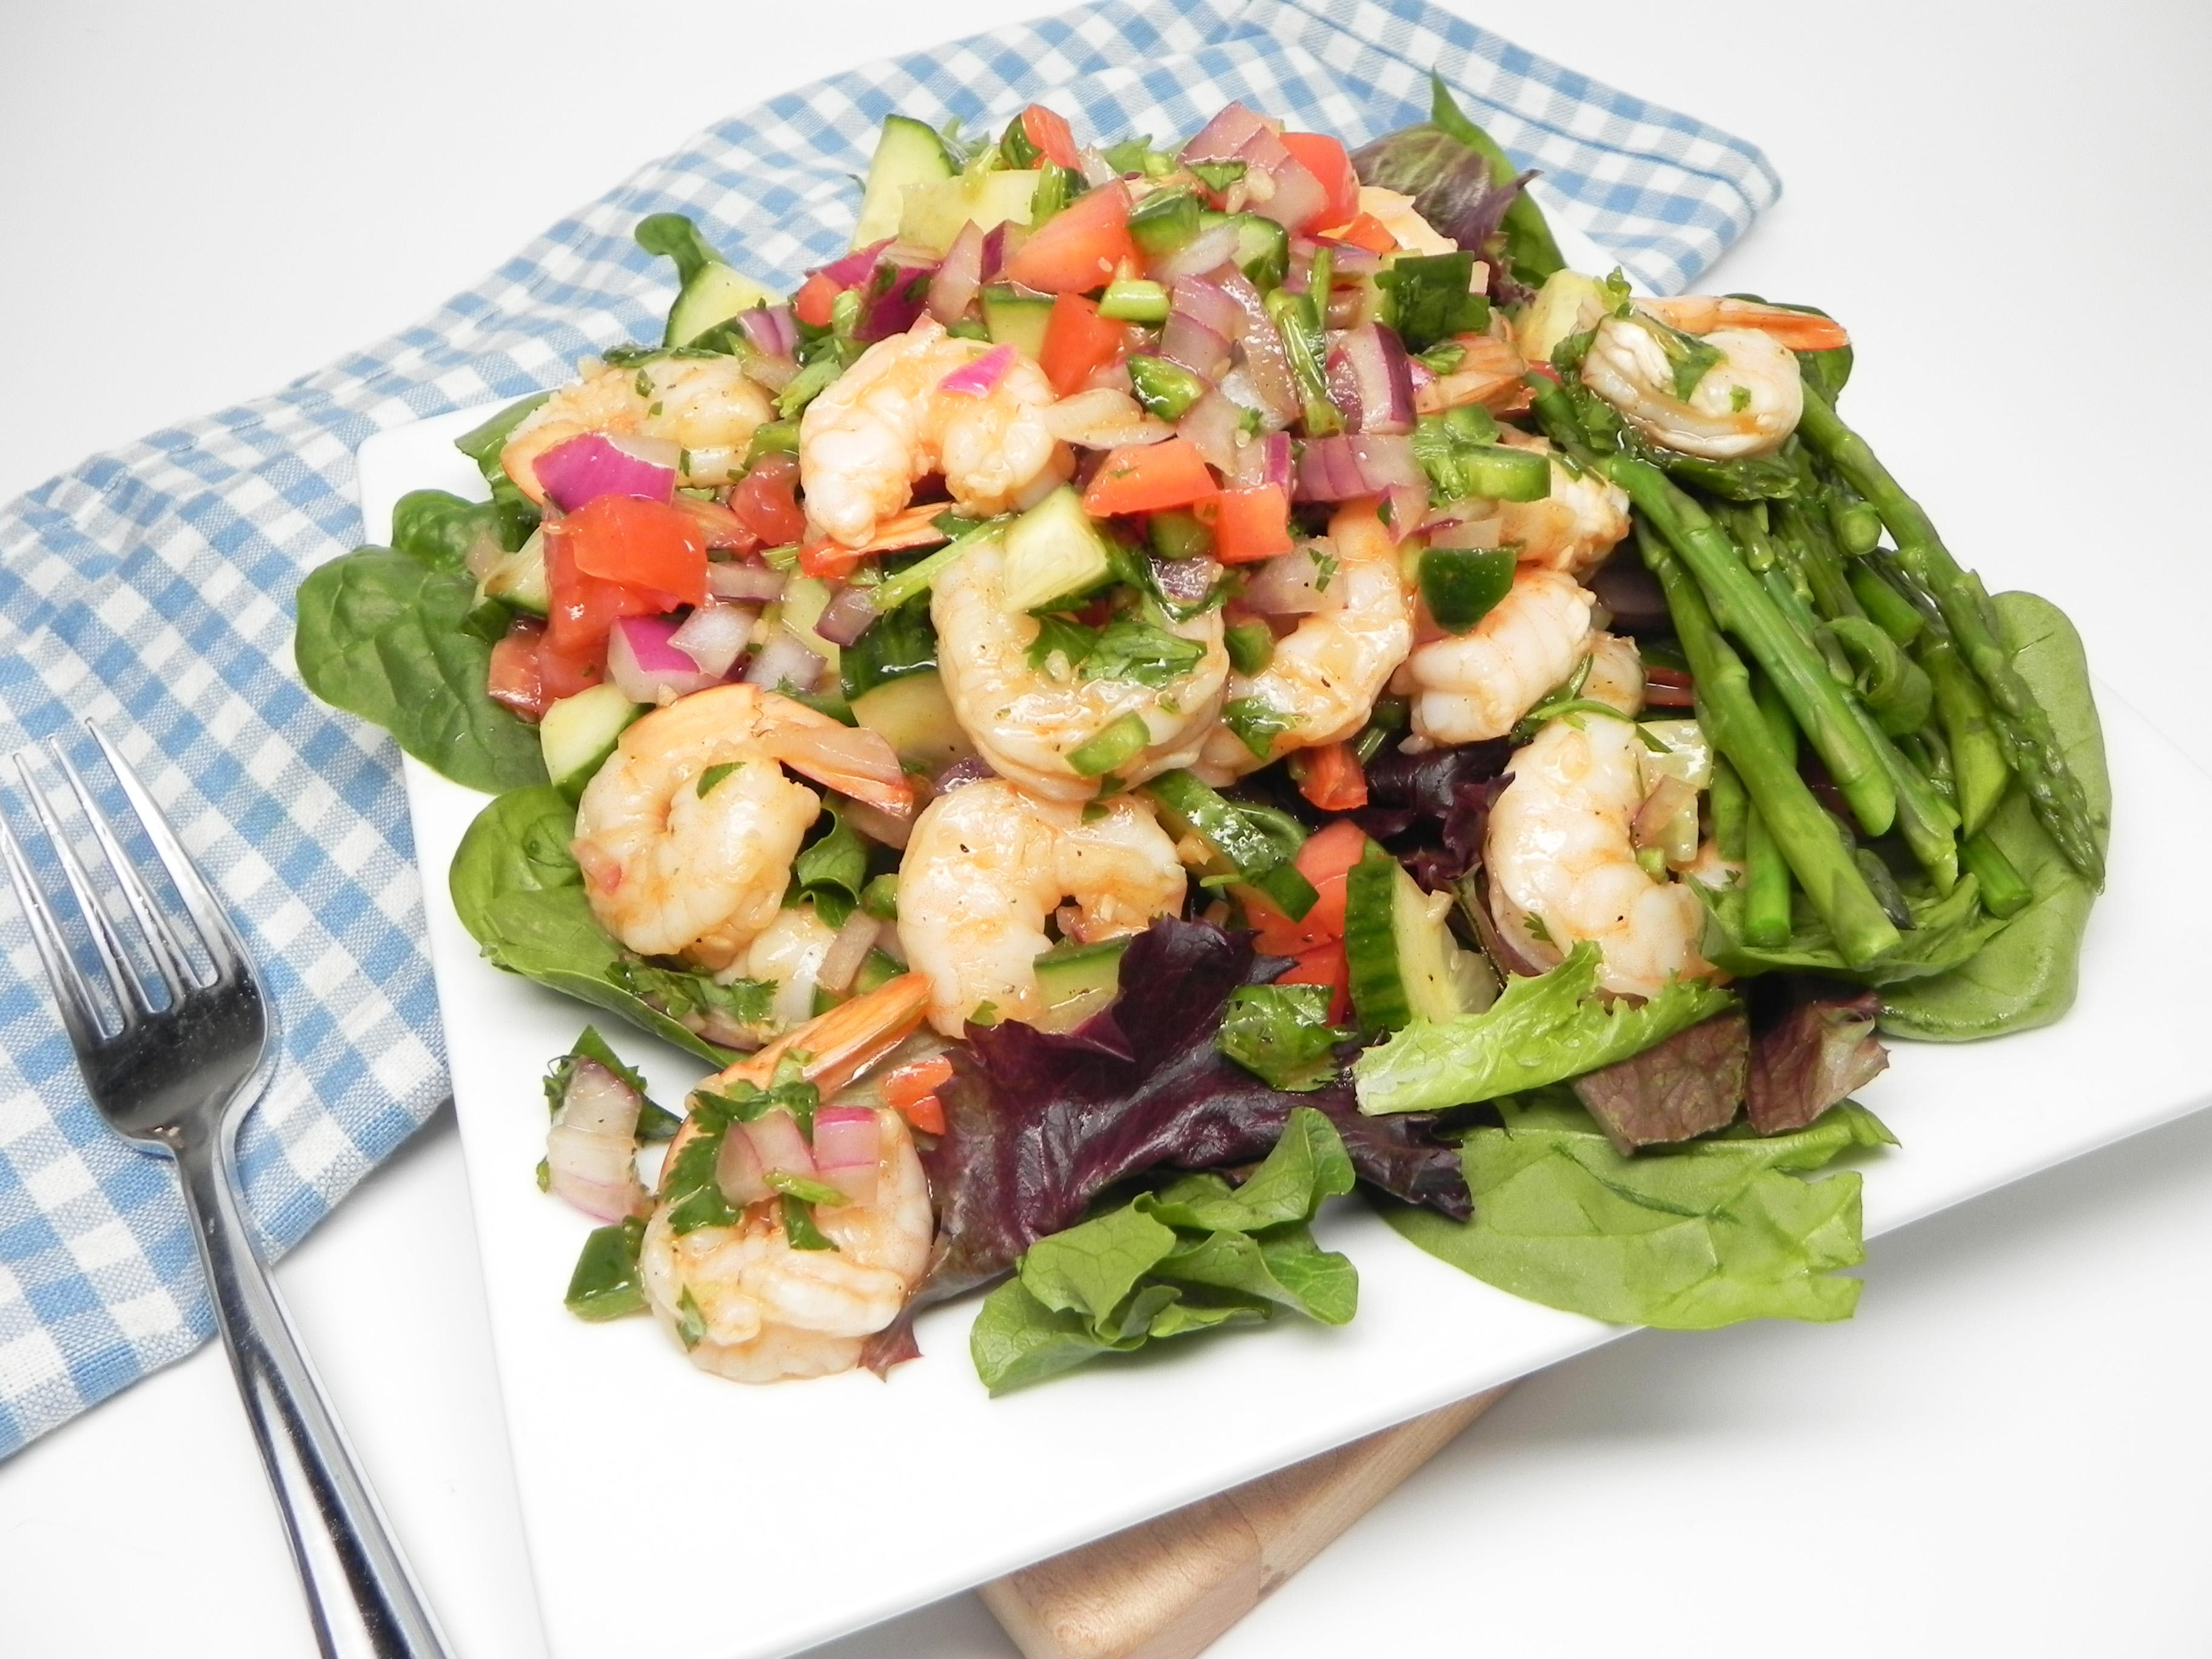 Gazpacho Salad with Shrimp